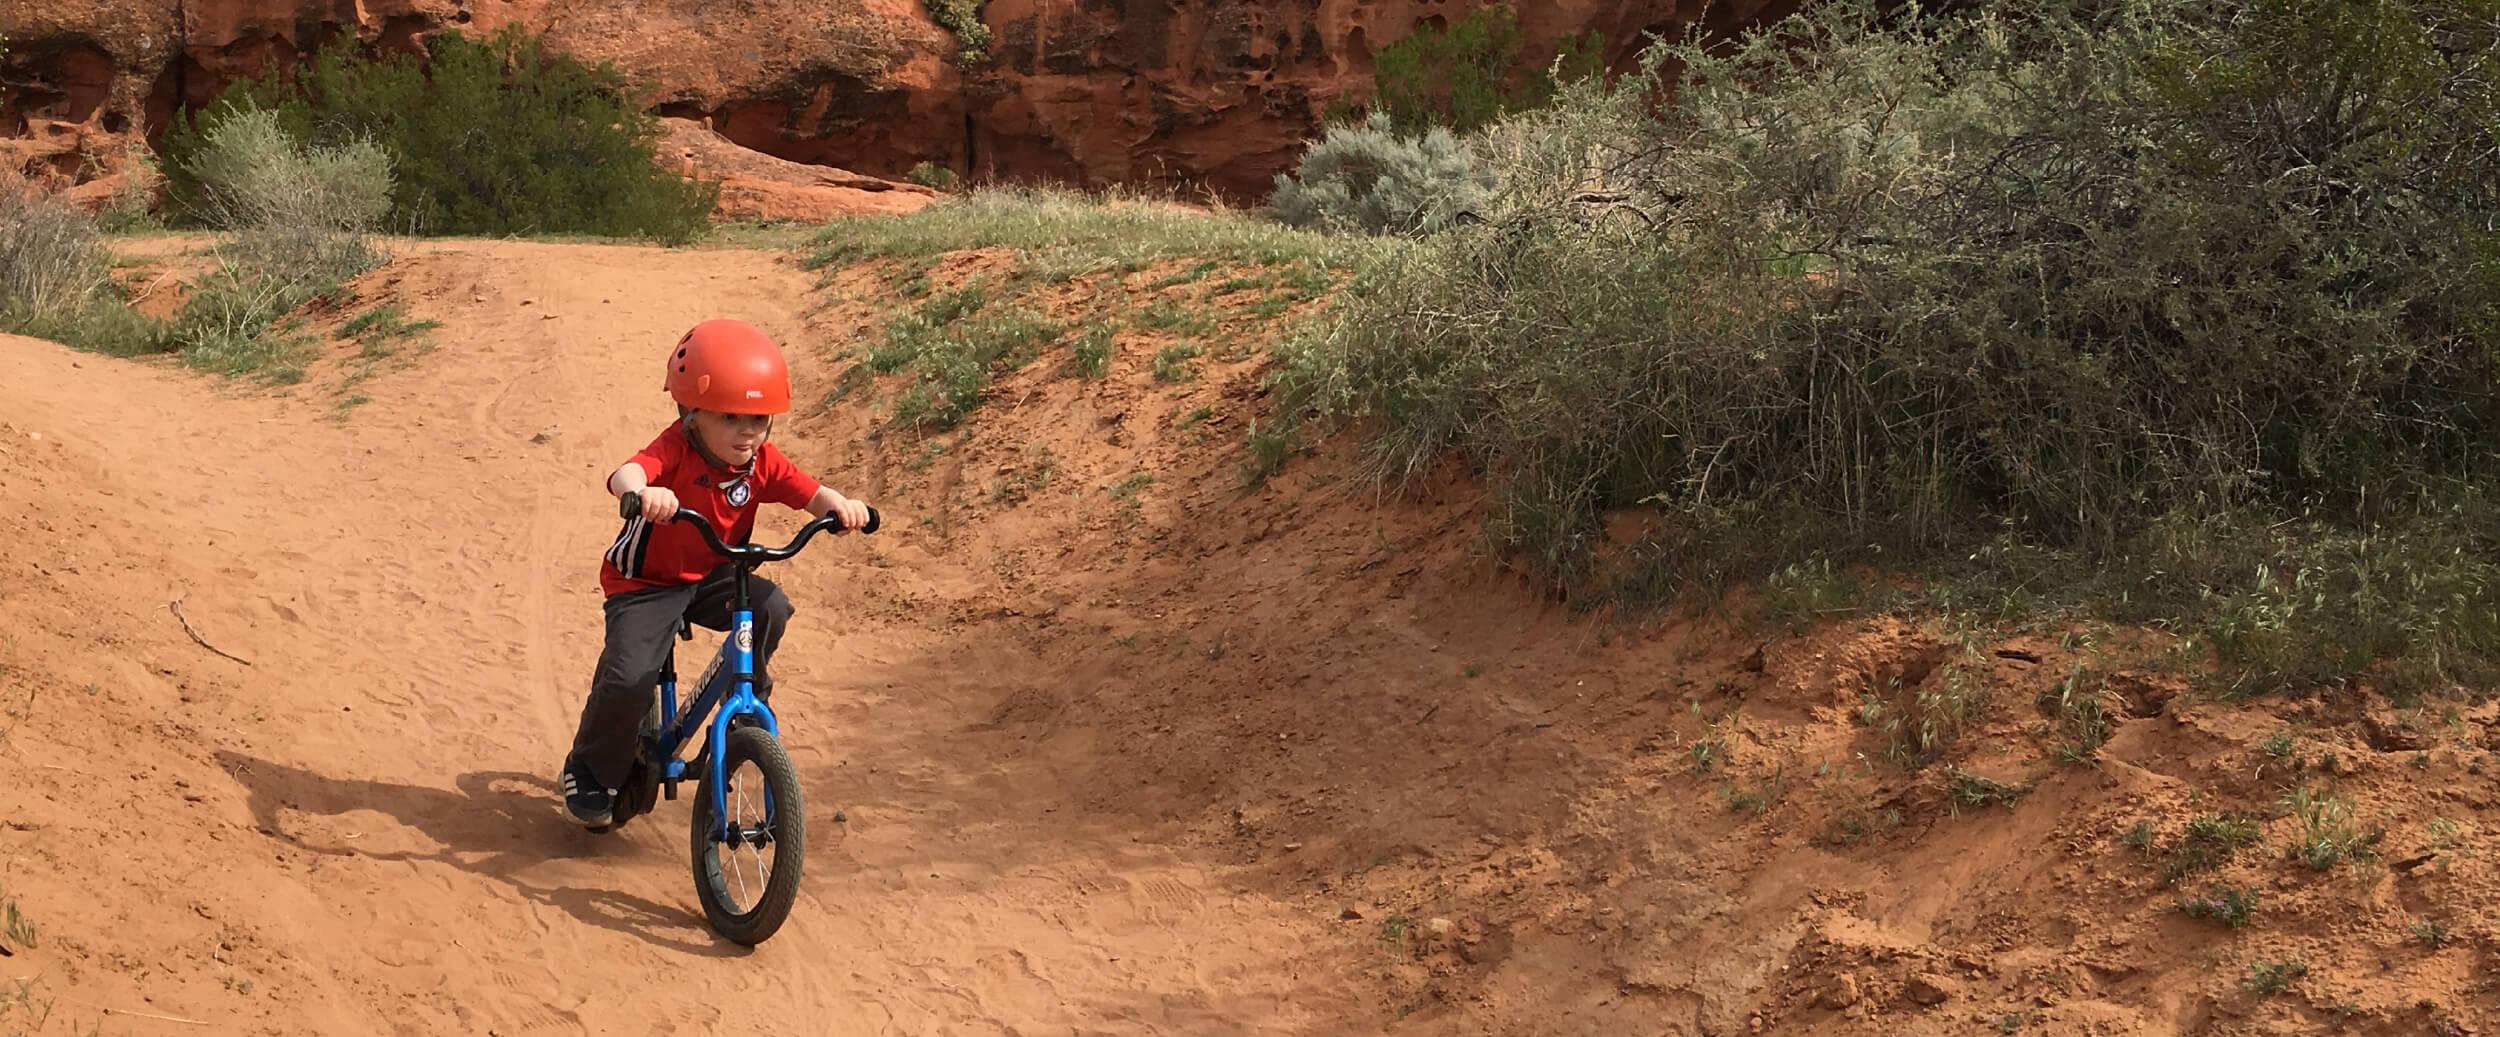 child riding Strider 14x balance bike on dirt track